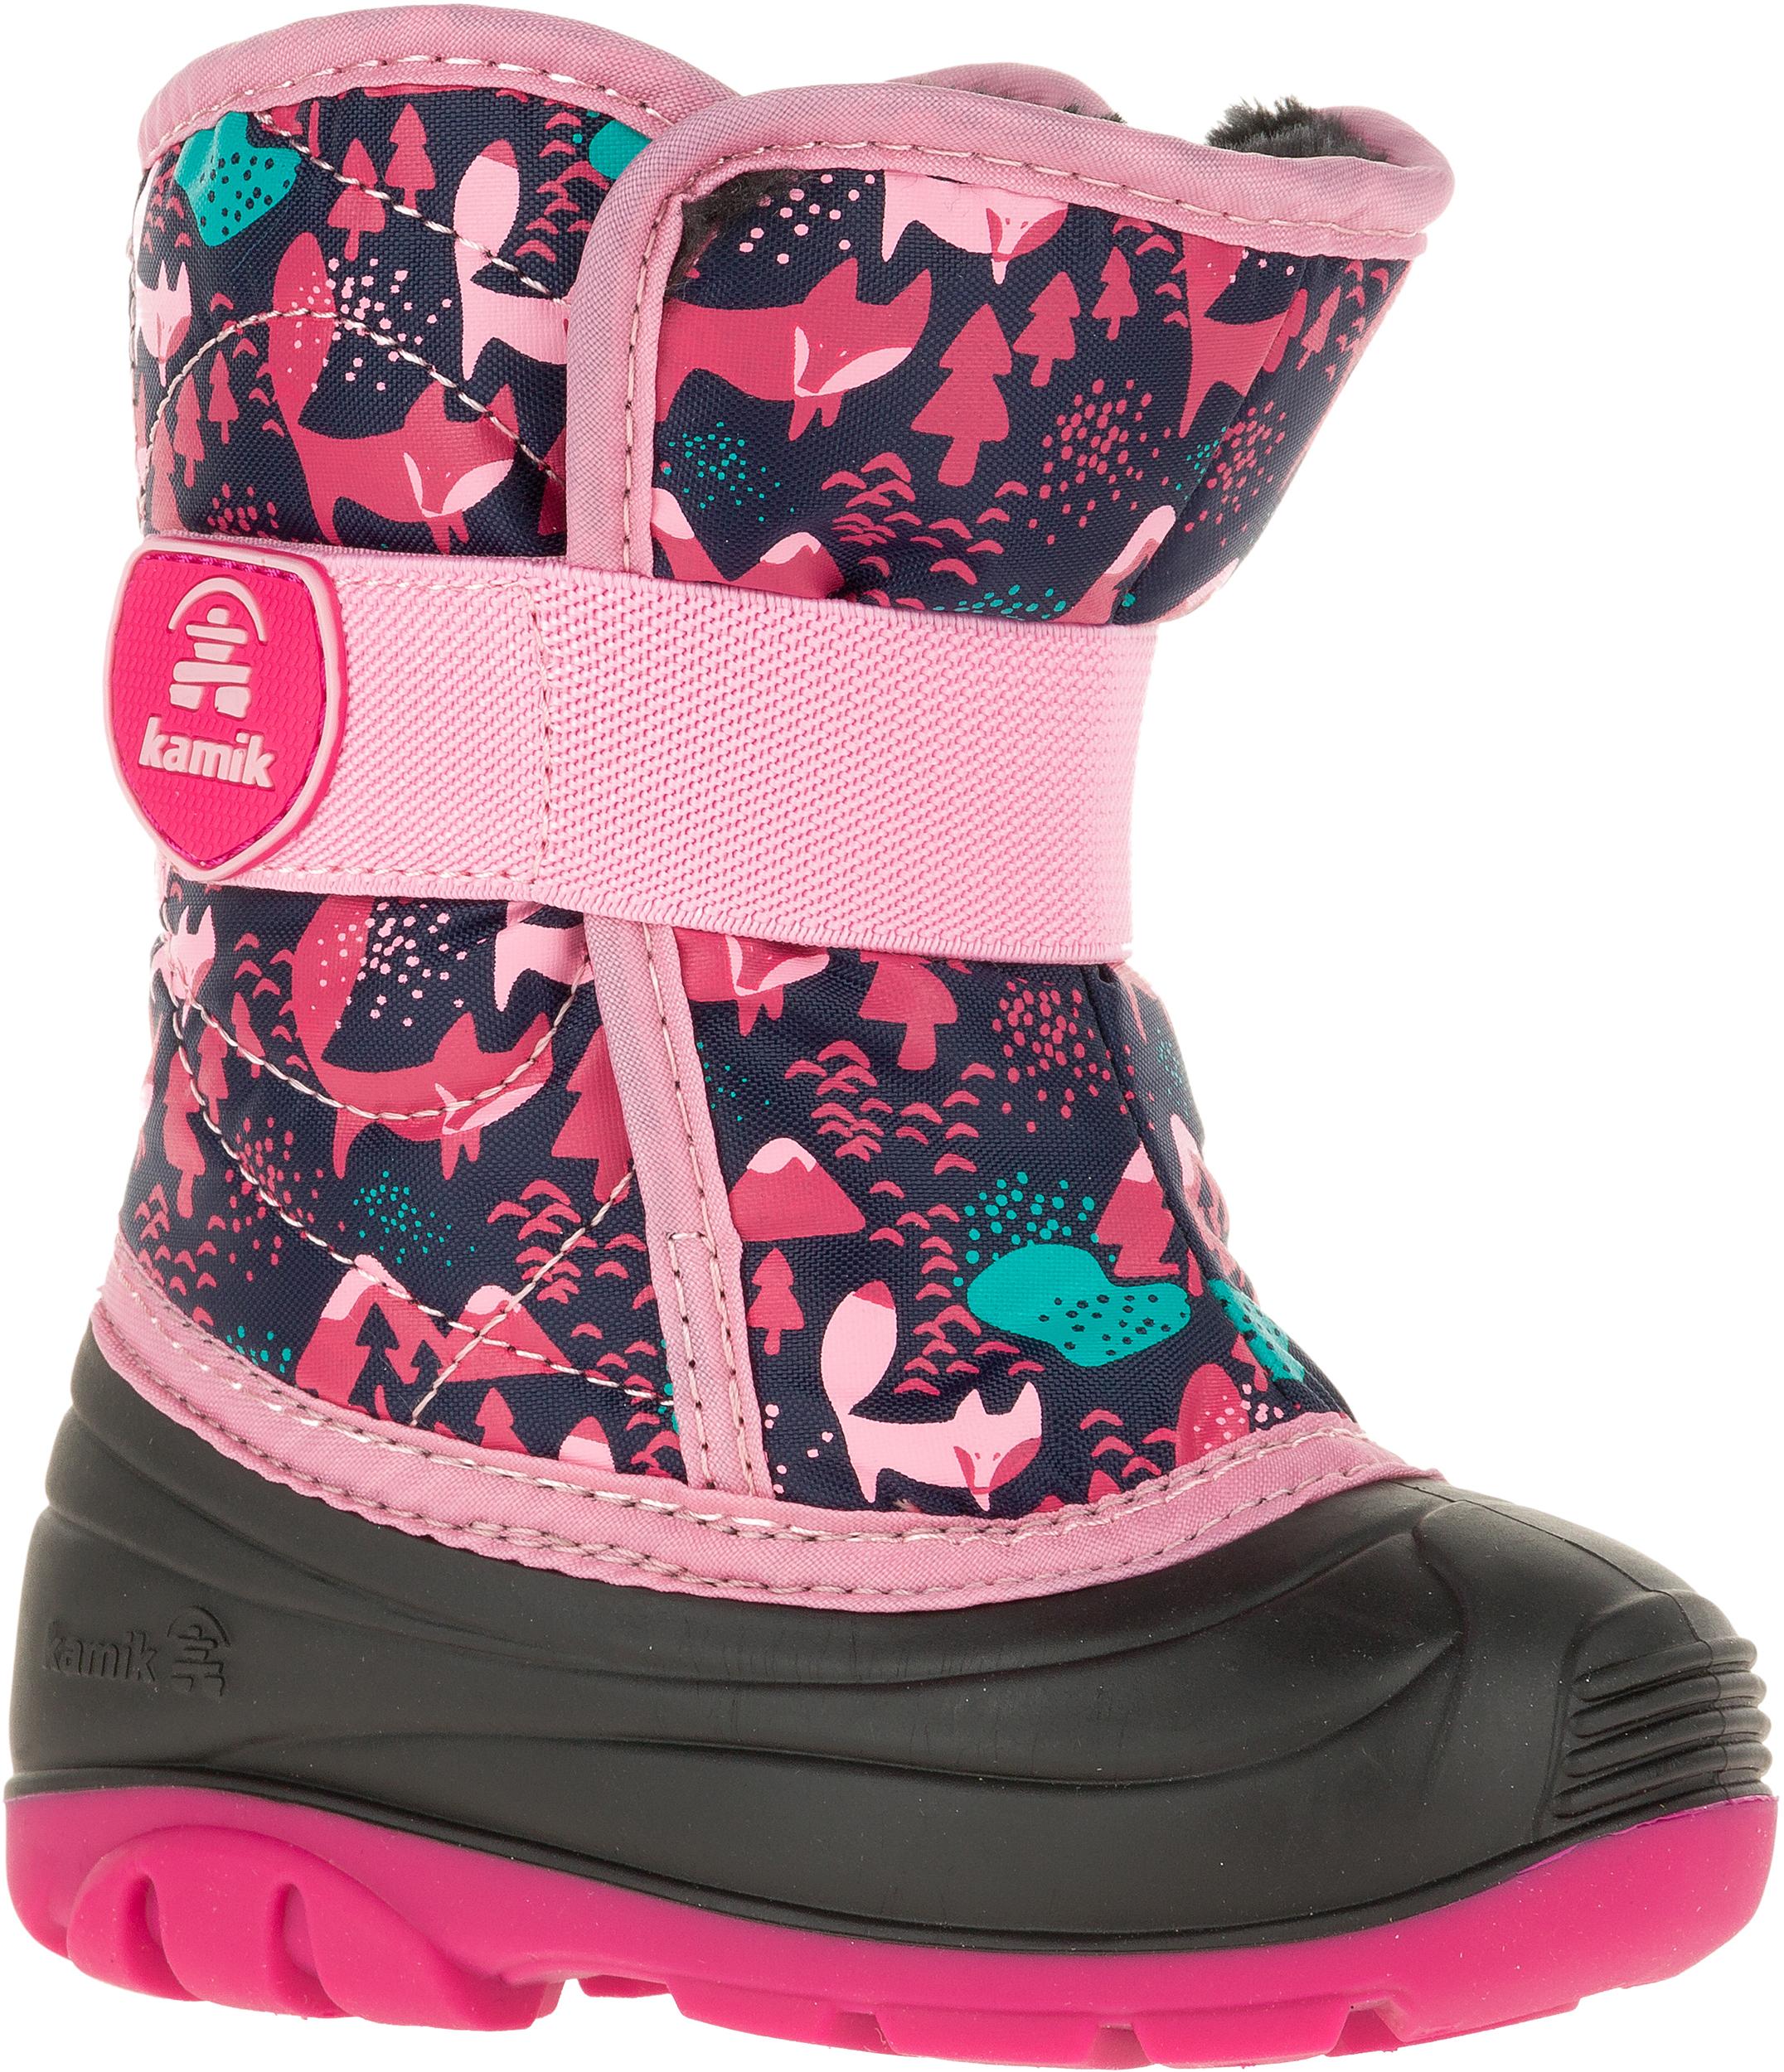 Kamik Snowbug 4 Boots Infants | MEC